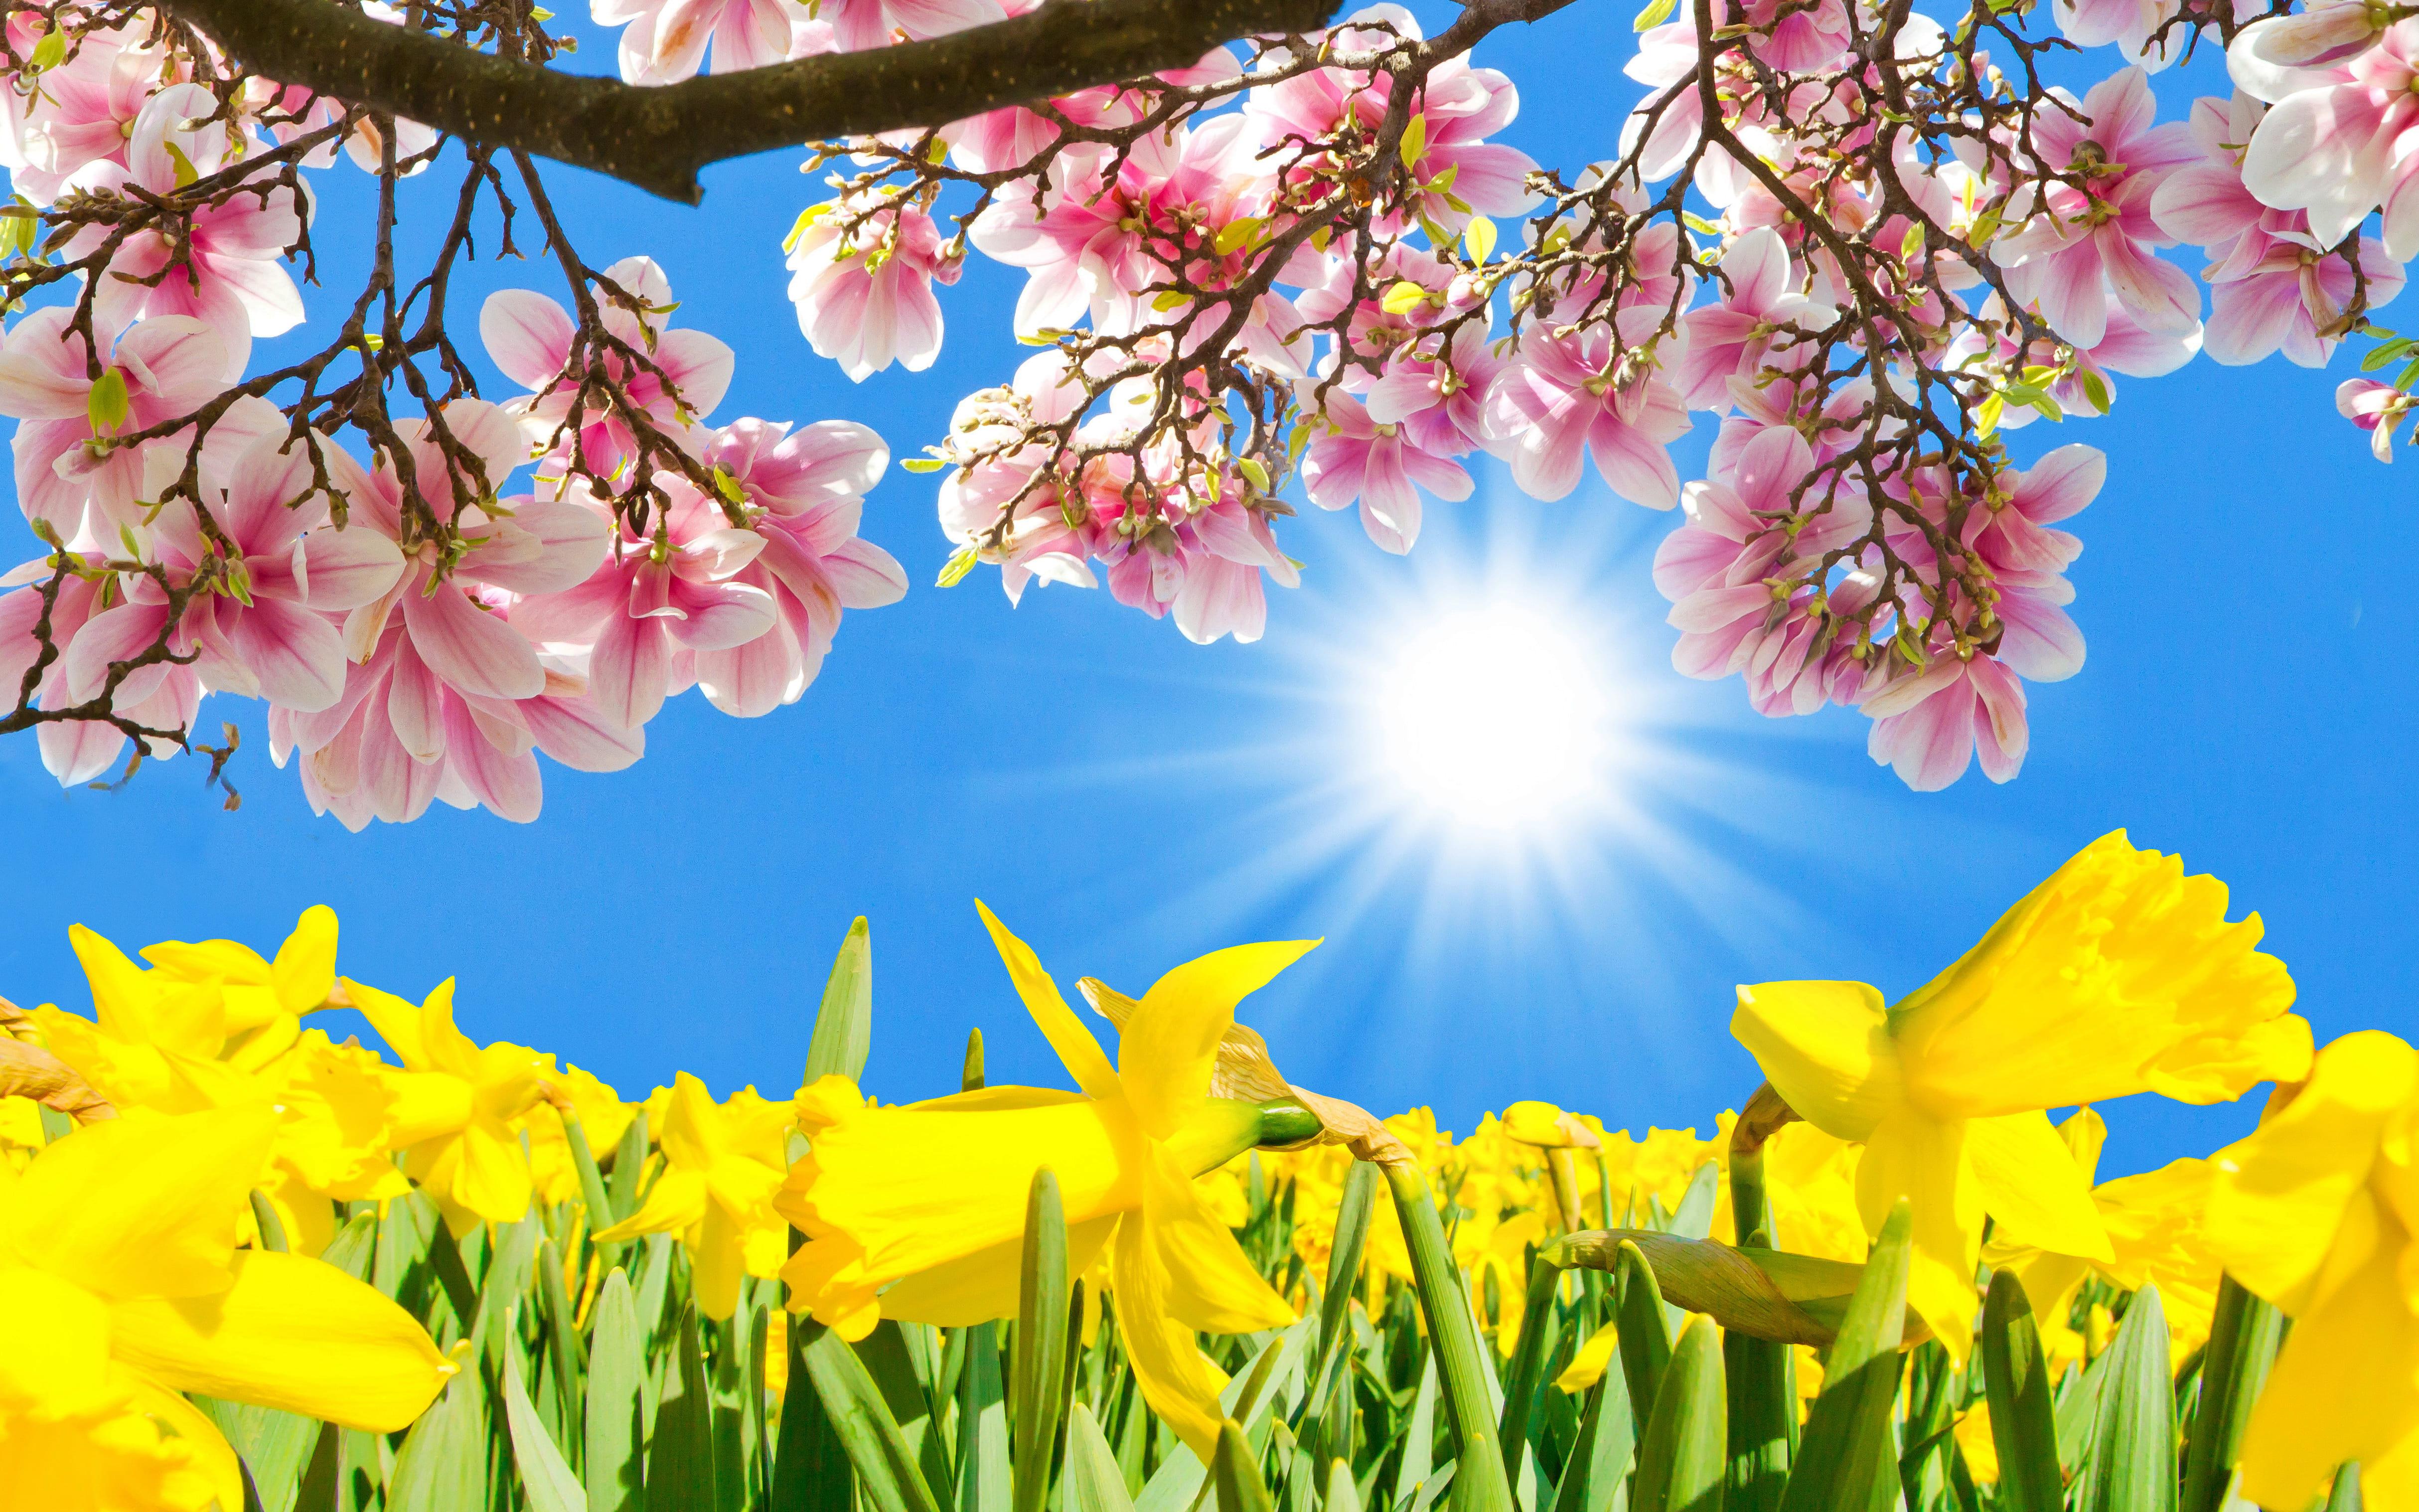 daffodils-photo-17